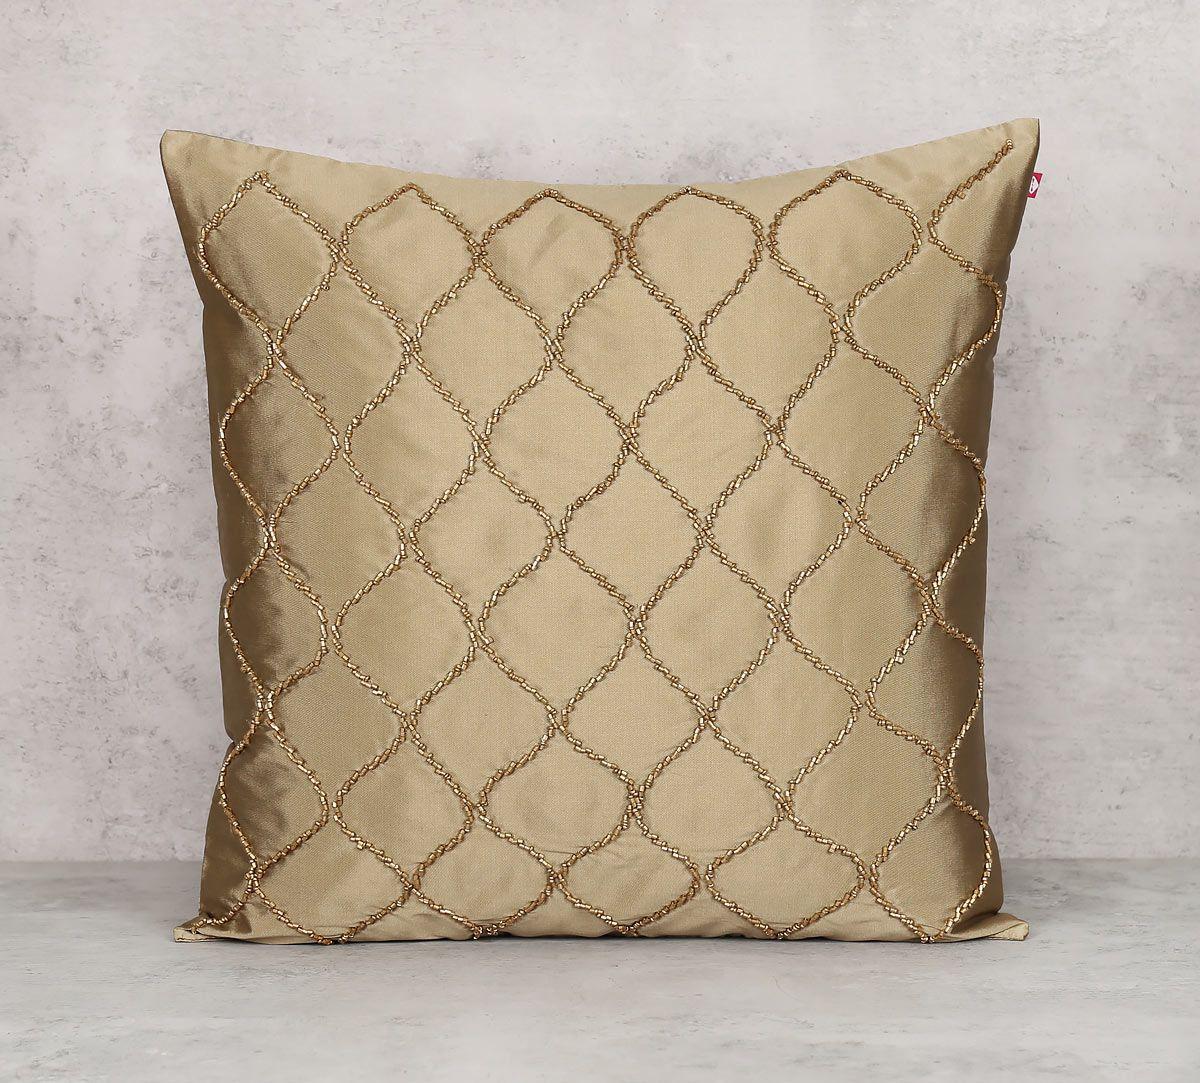 India Circus Gold Bead Beige Cushion Cover